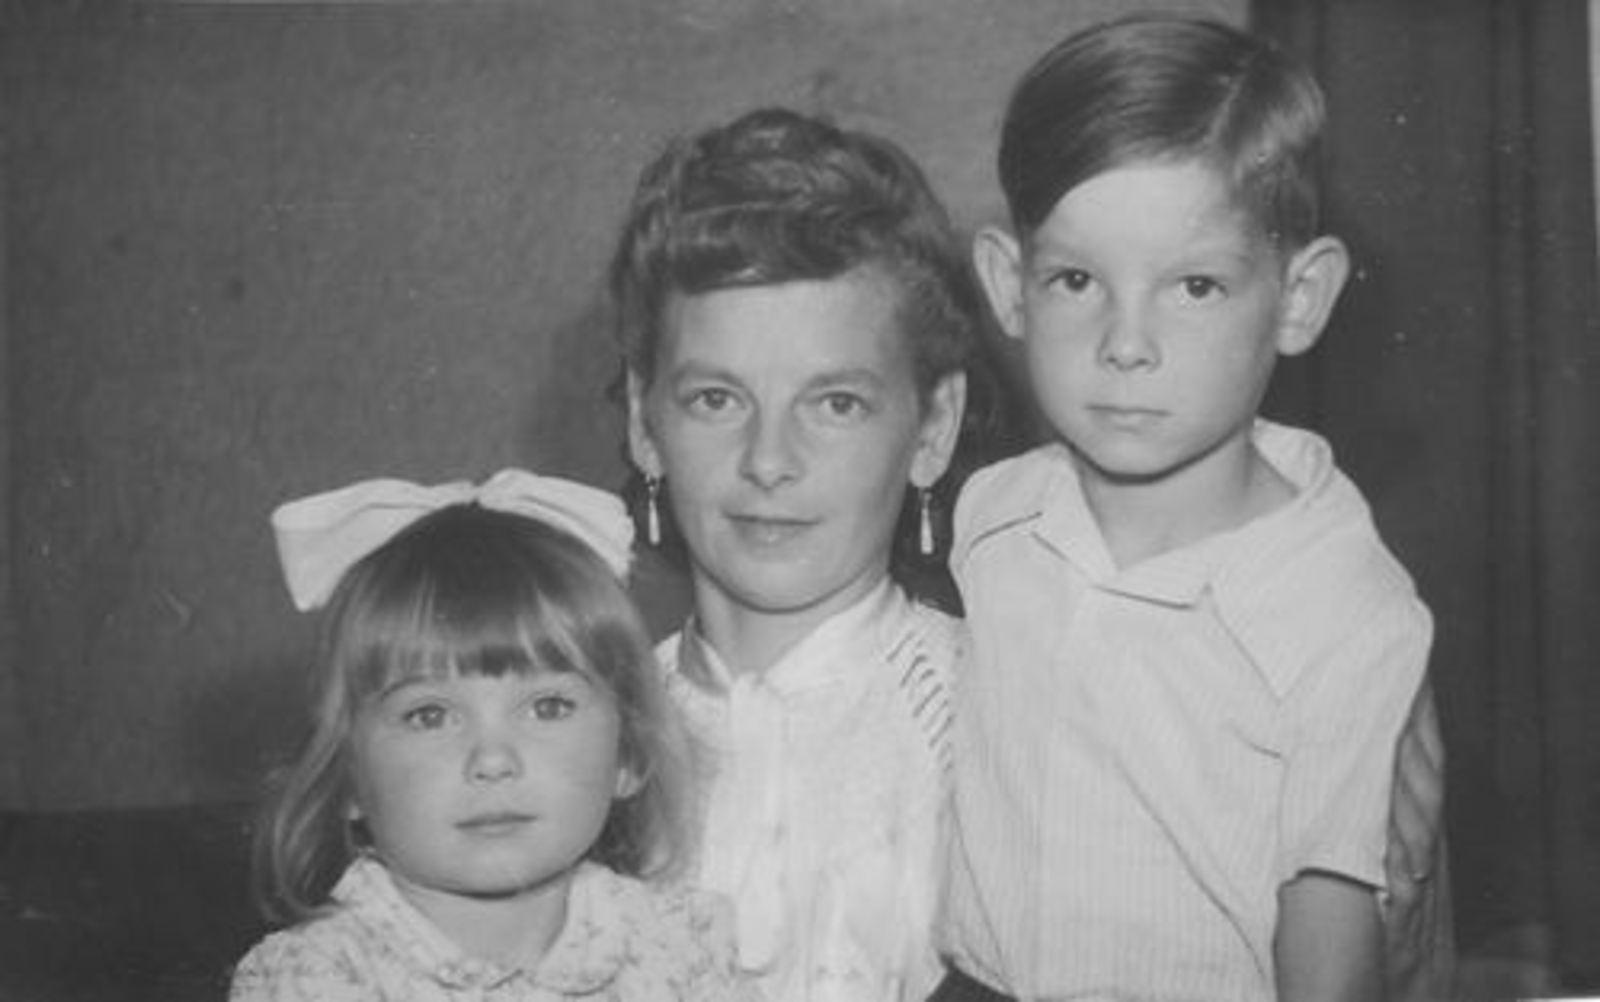 Koolbergen-Stiekema Tinie 1916 1946± met kinderen Ellie en Aad